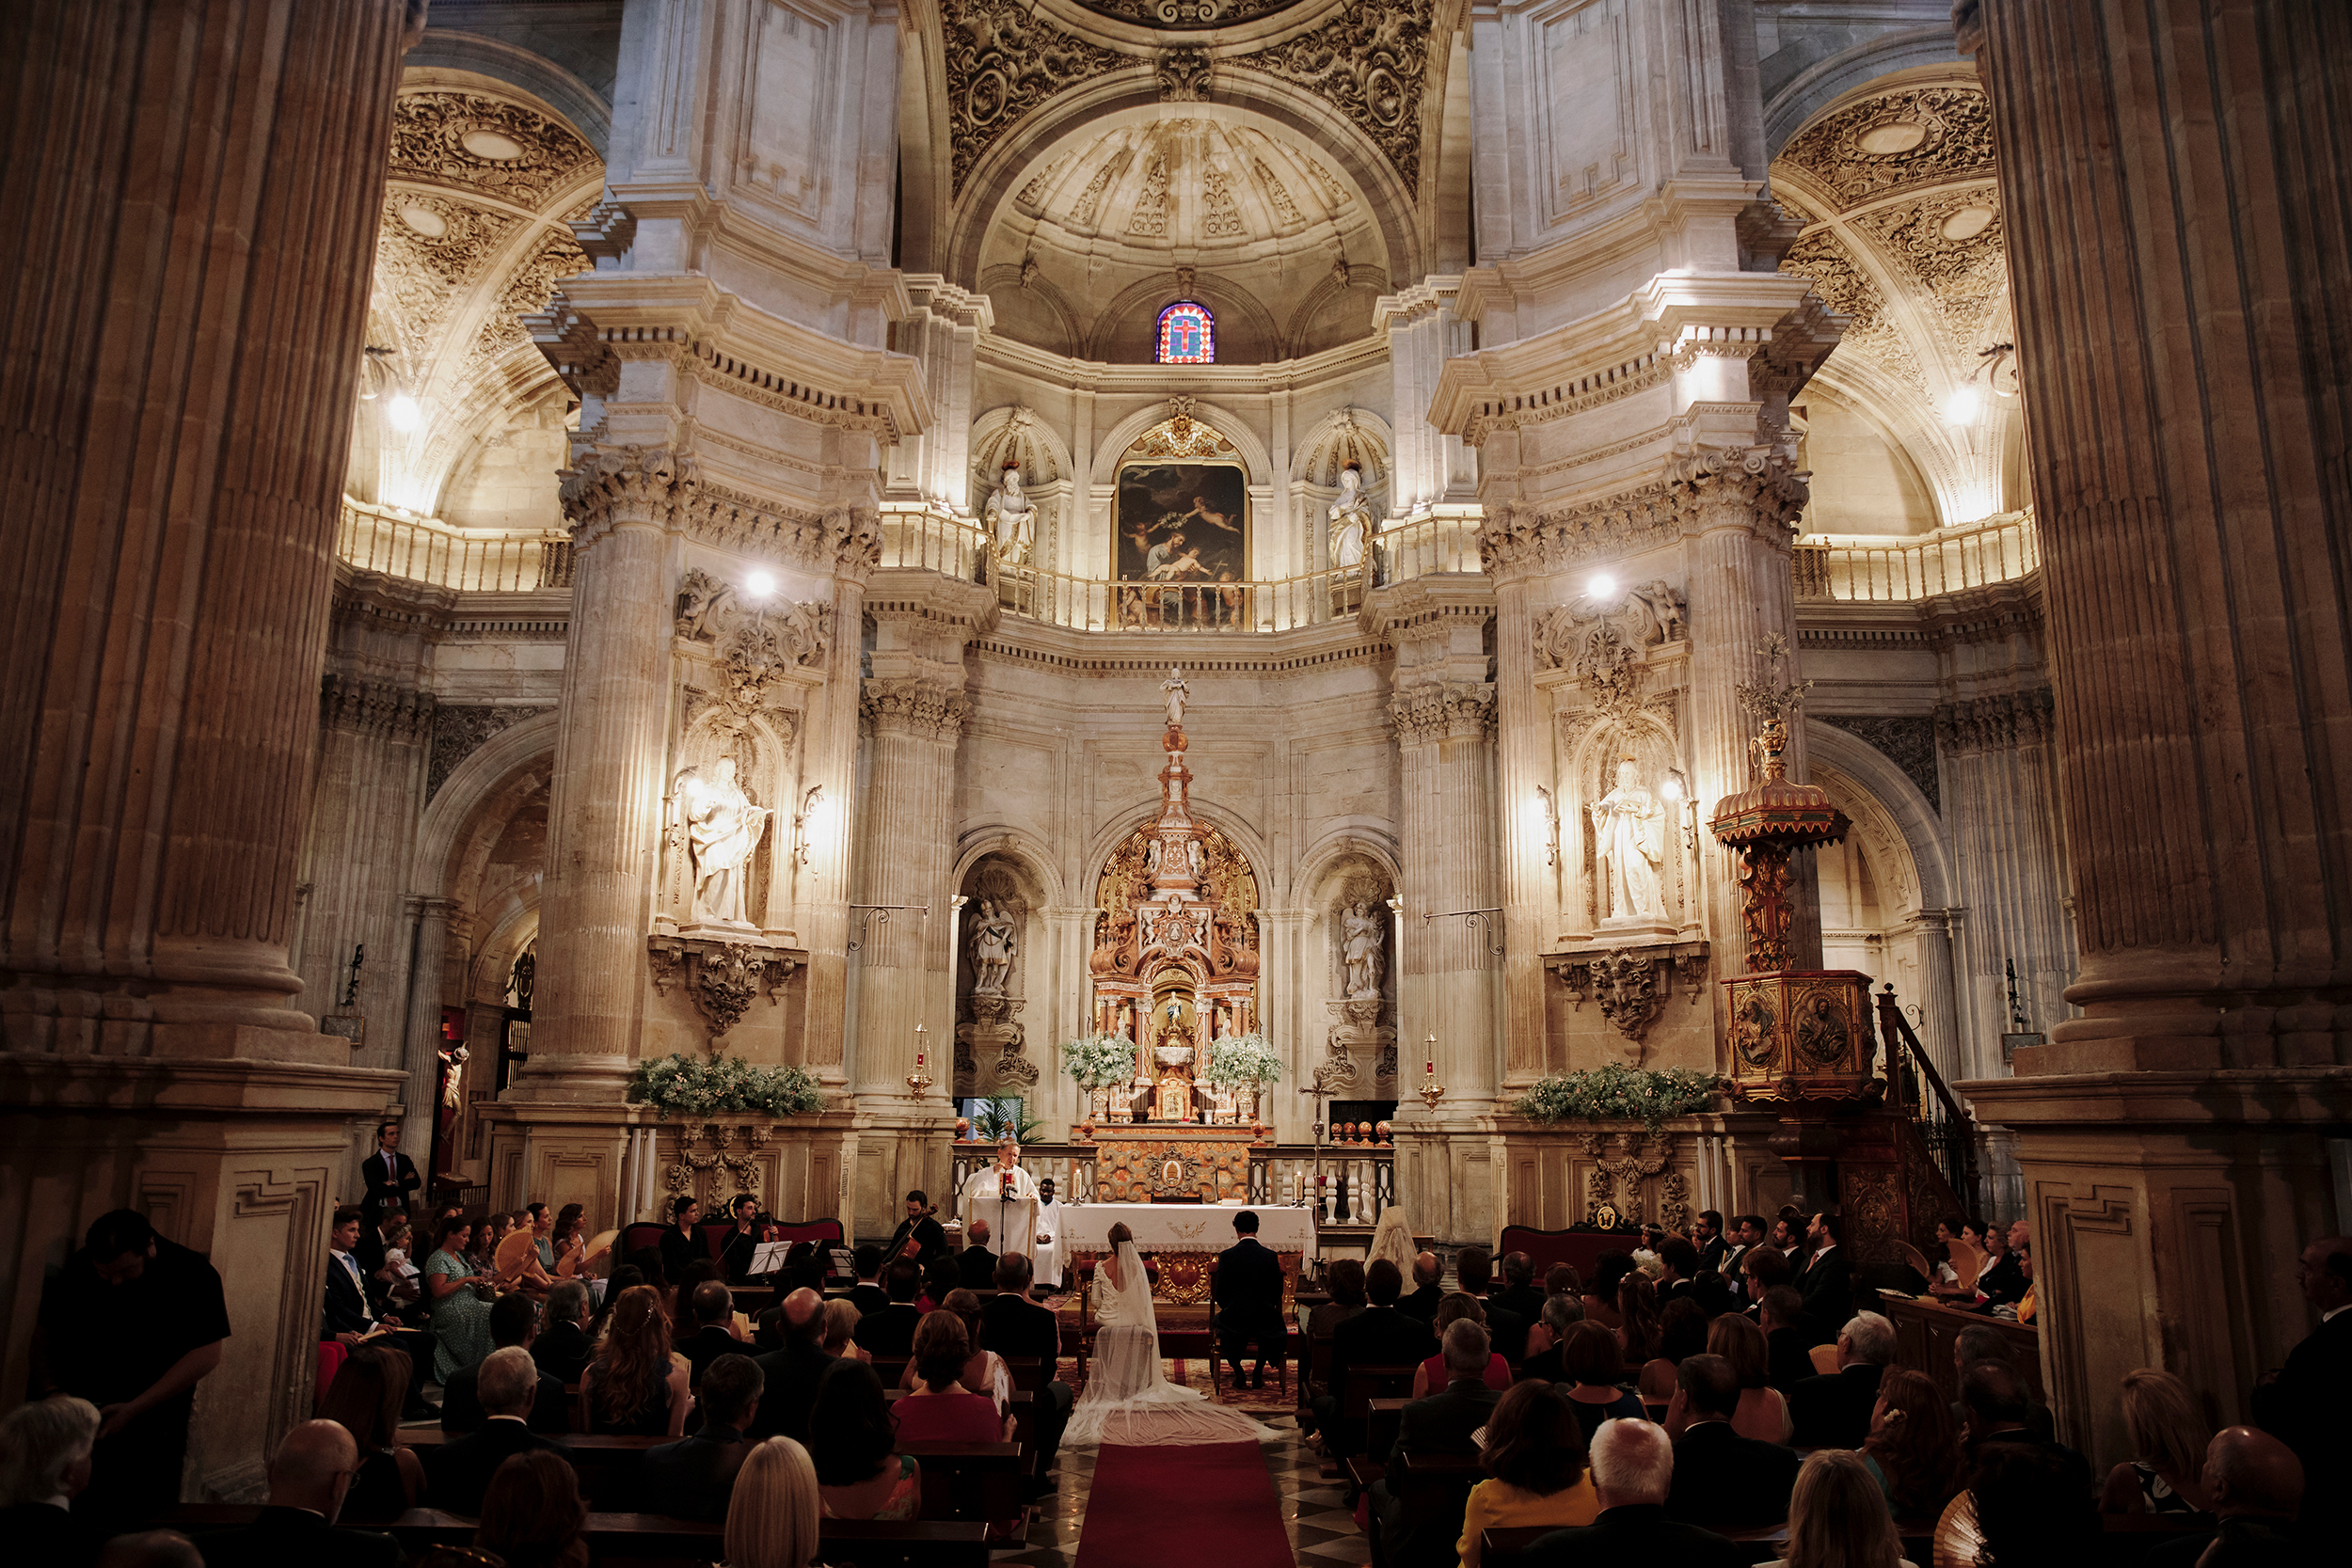 fotografo-bodas-granada-catedral-sagrario-jose-reyes_037.jpg